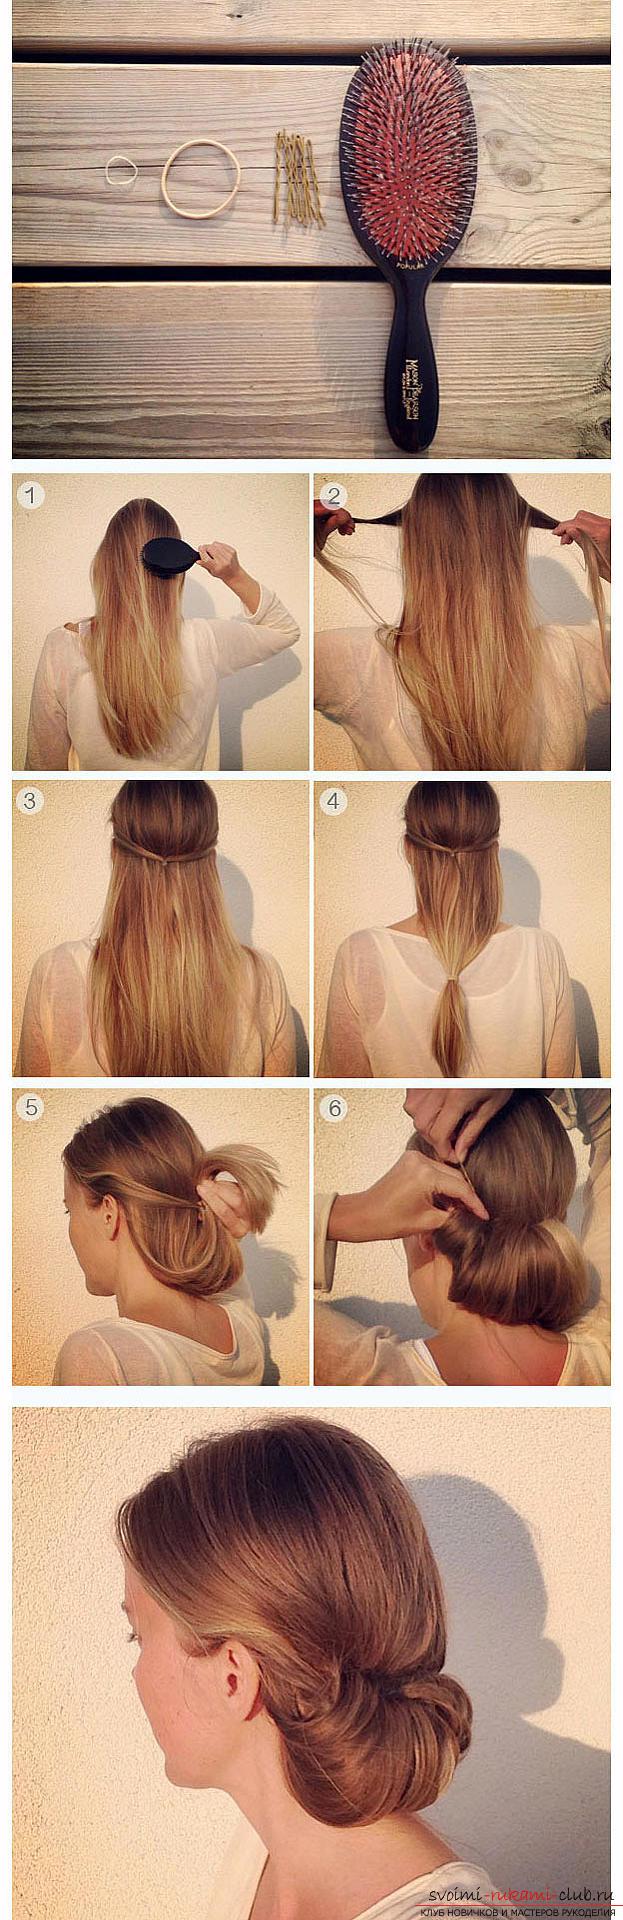 Стрижка для средних волос своими руками